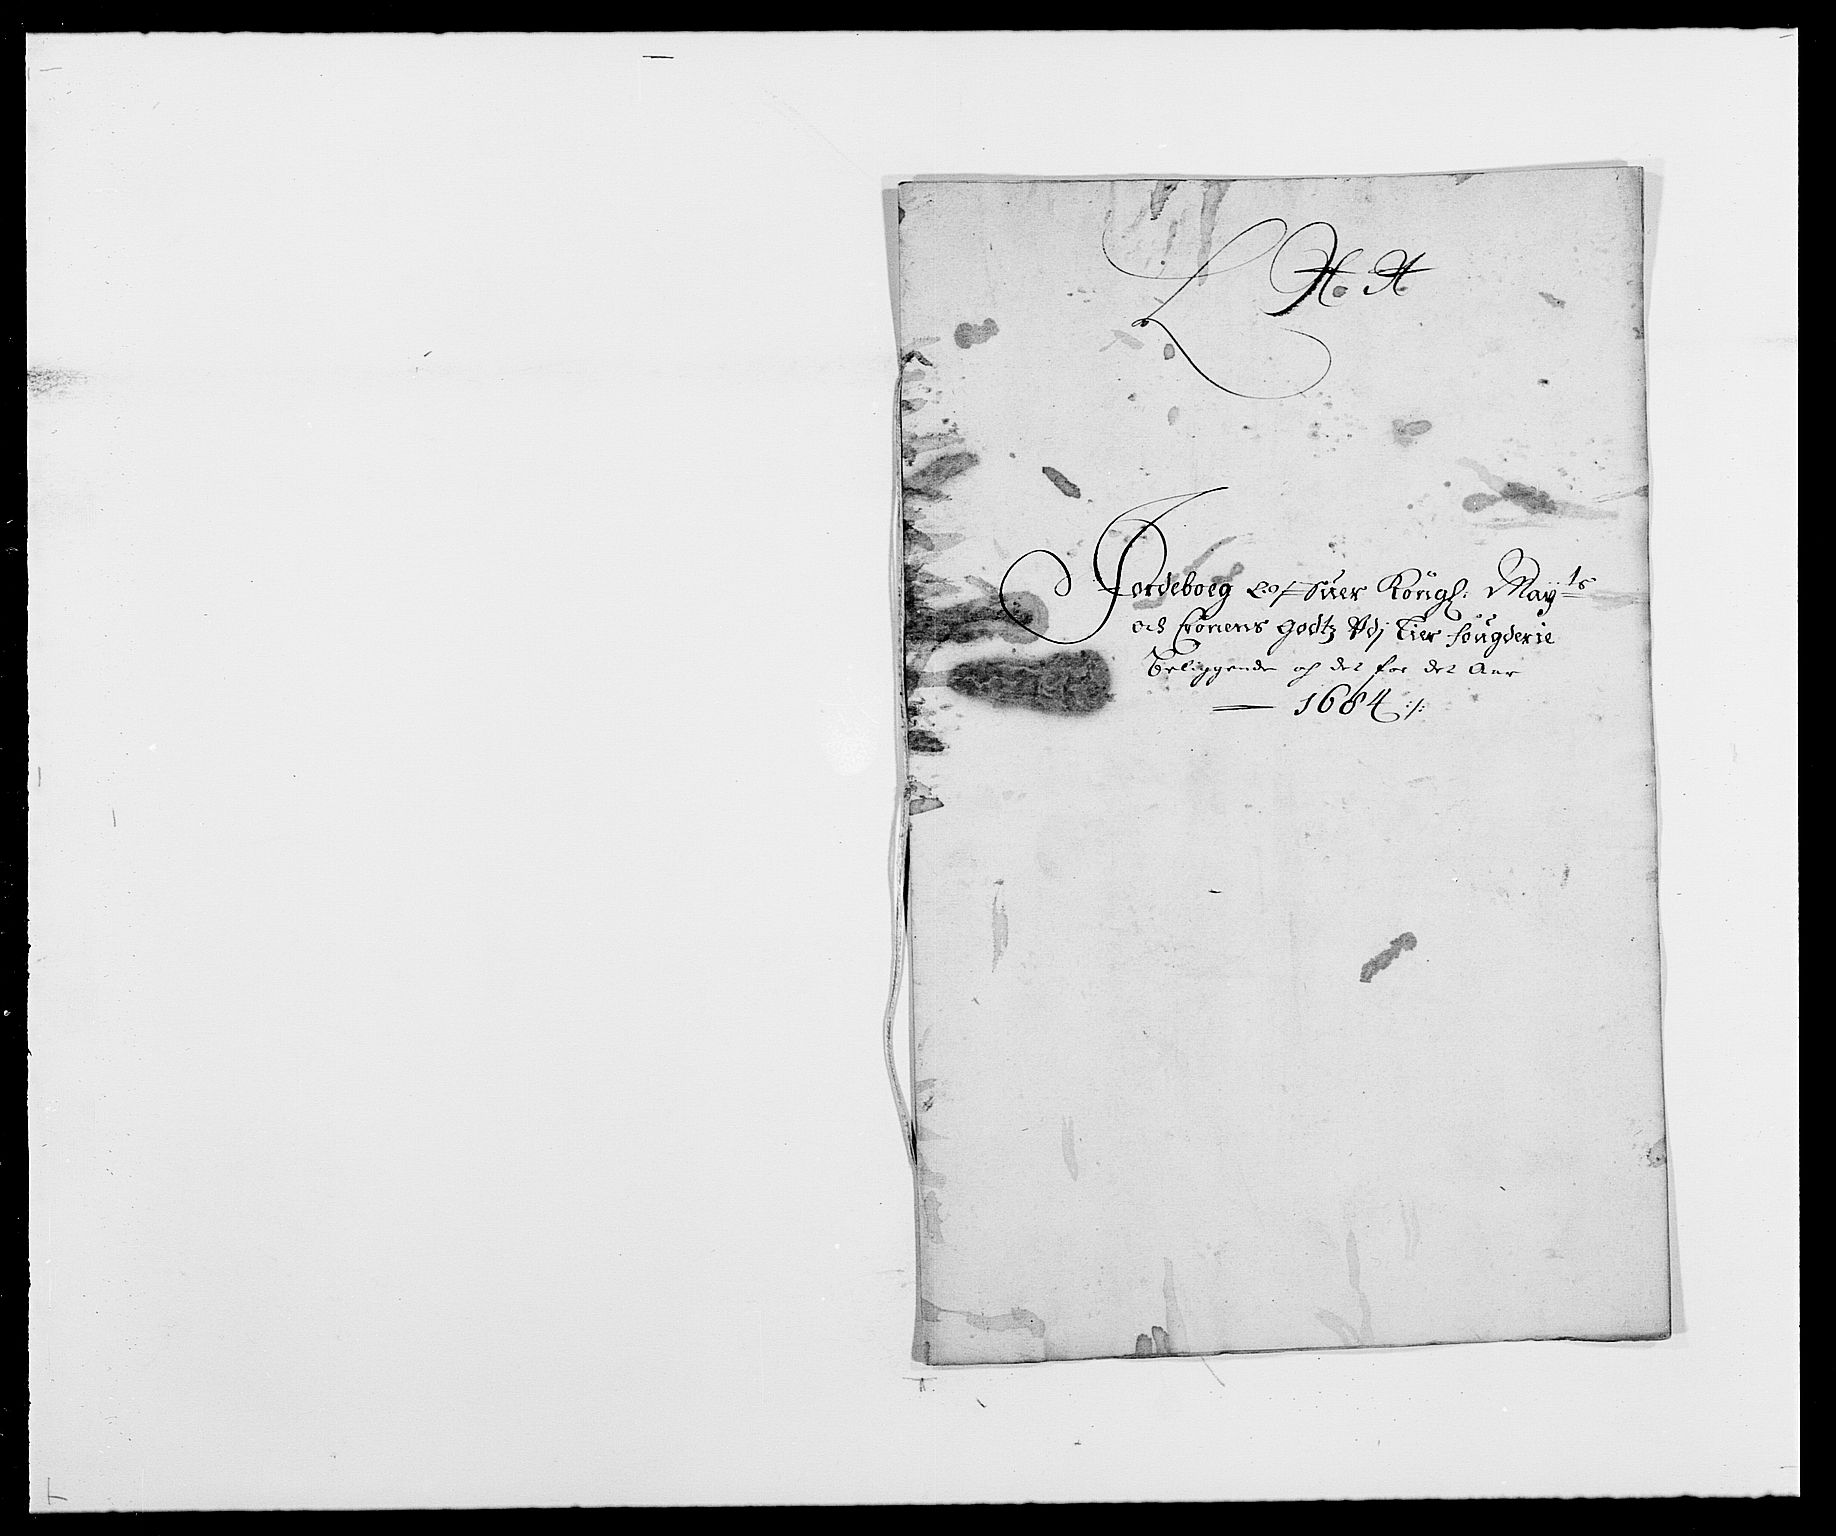 RA, Rentekammeret inntil 1814, Reviderte regnskaper, Fogderegnskap, R27/L1687: Fogderegnskap Lier, 1678-1686, s. 71